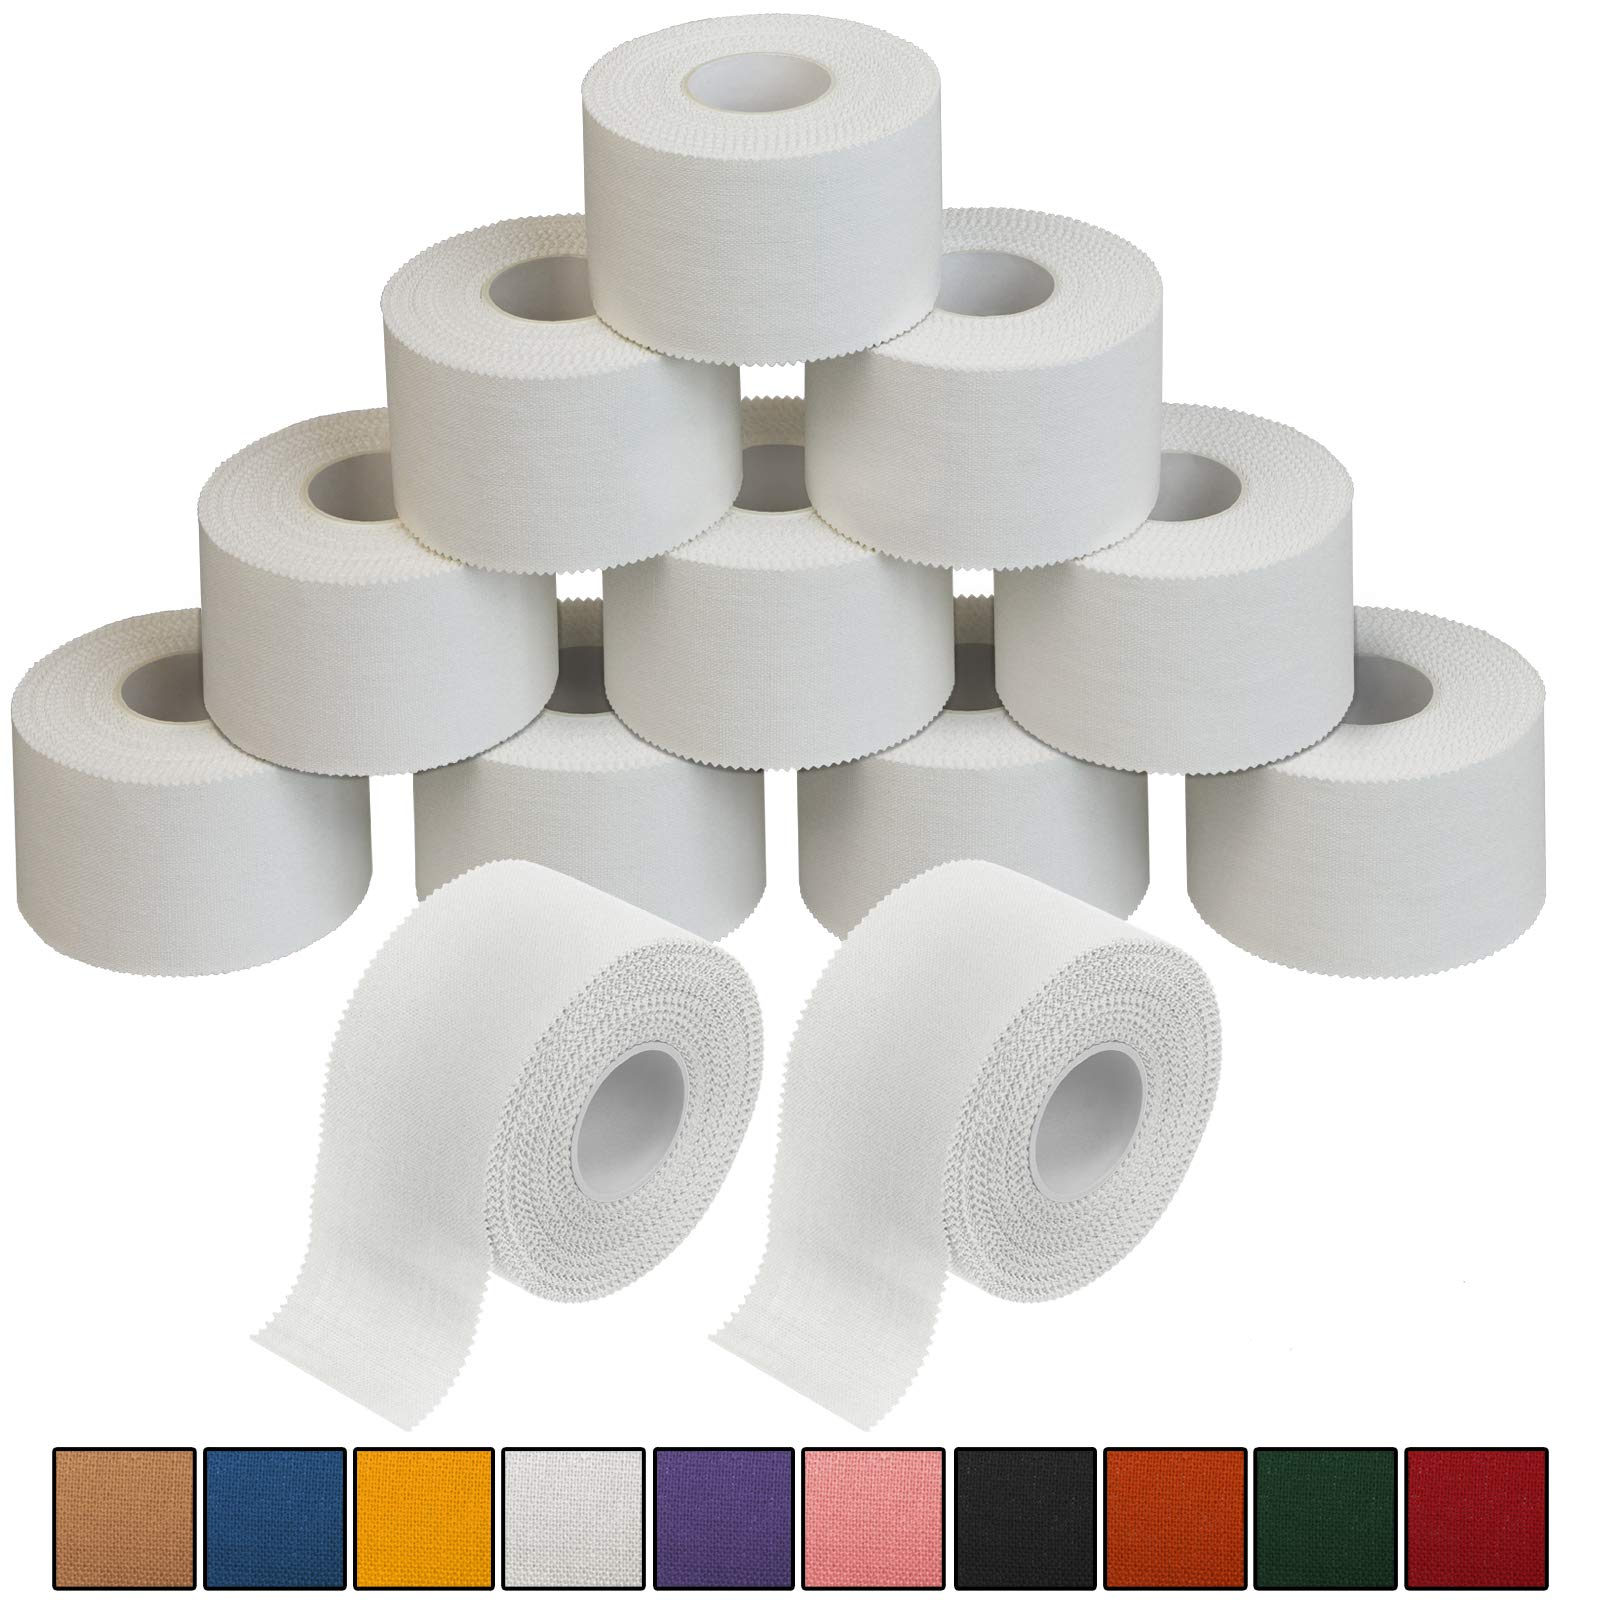 ALPIDEX 12 x Sports Tape 10 m x 3.8 cm zinc oxide tape finger tape